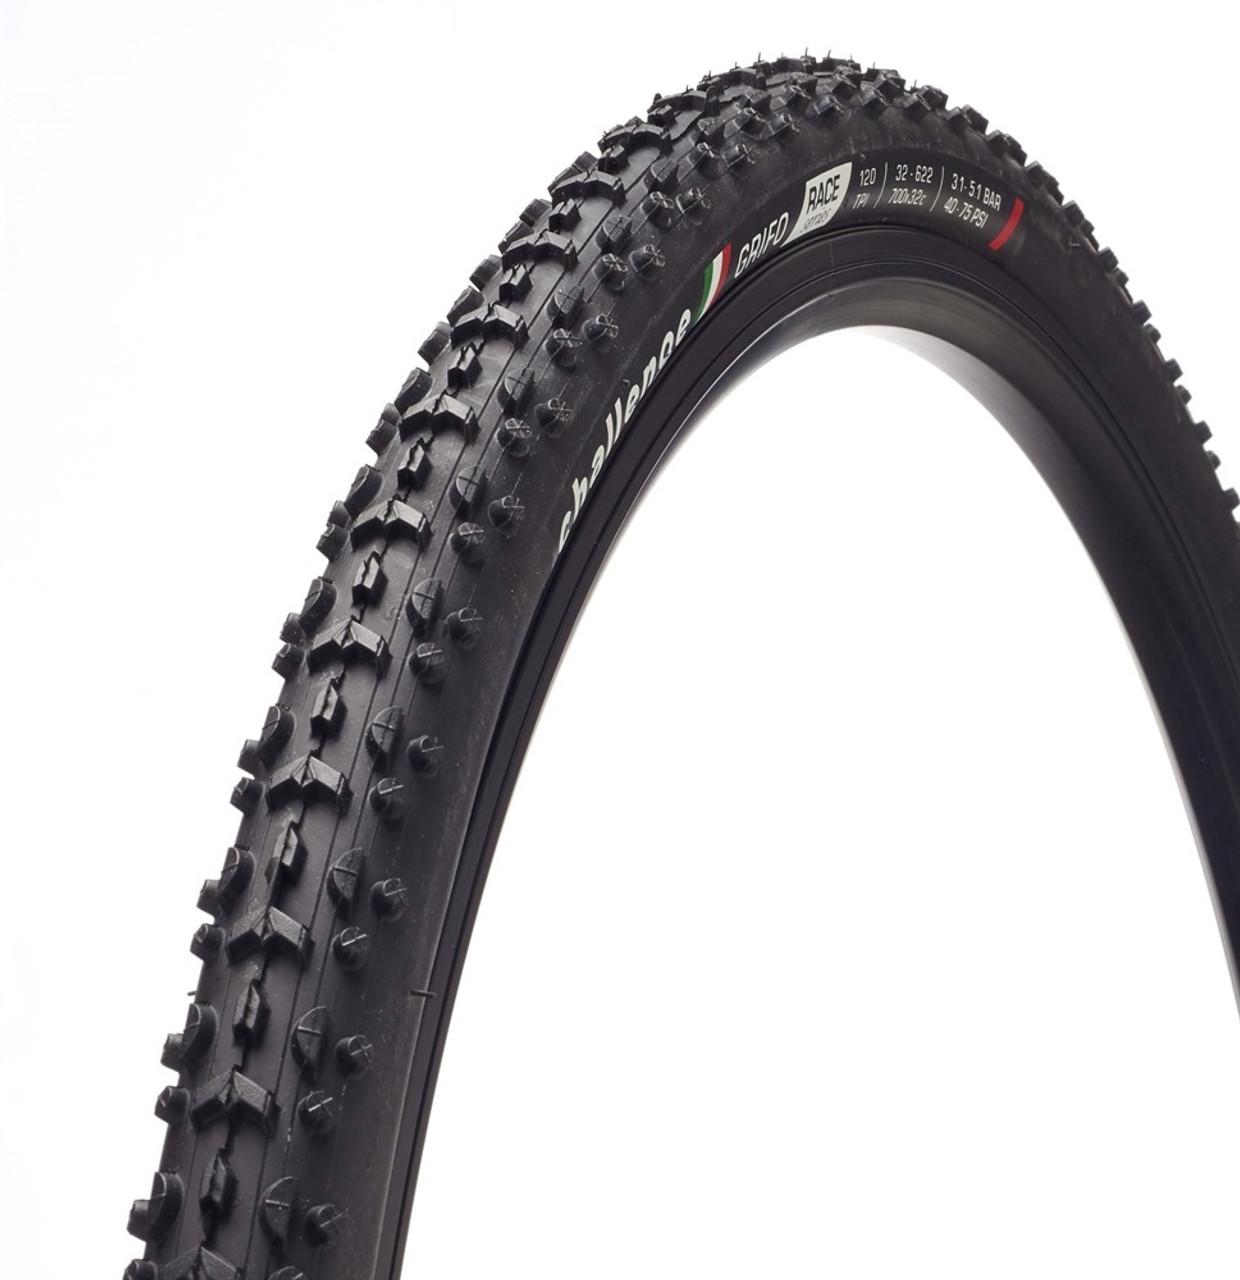 Challenge Grifo Race Vulcanized Clincher Cyclocross Tyre 700 x 33 Black